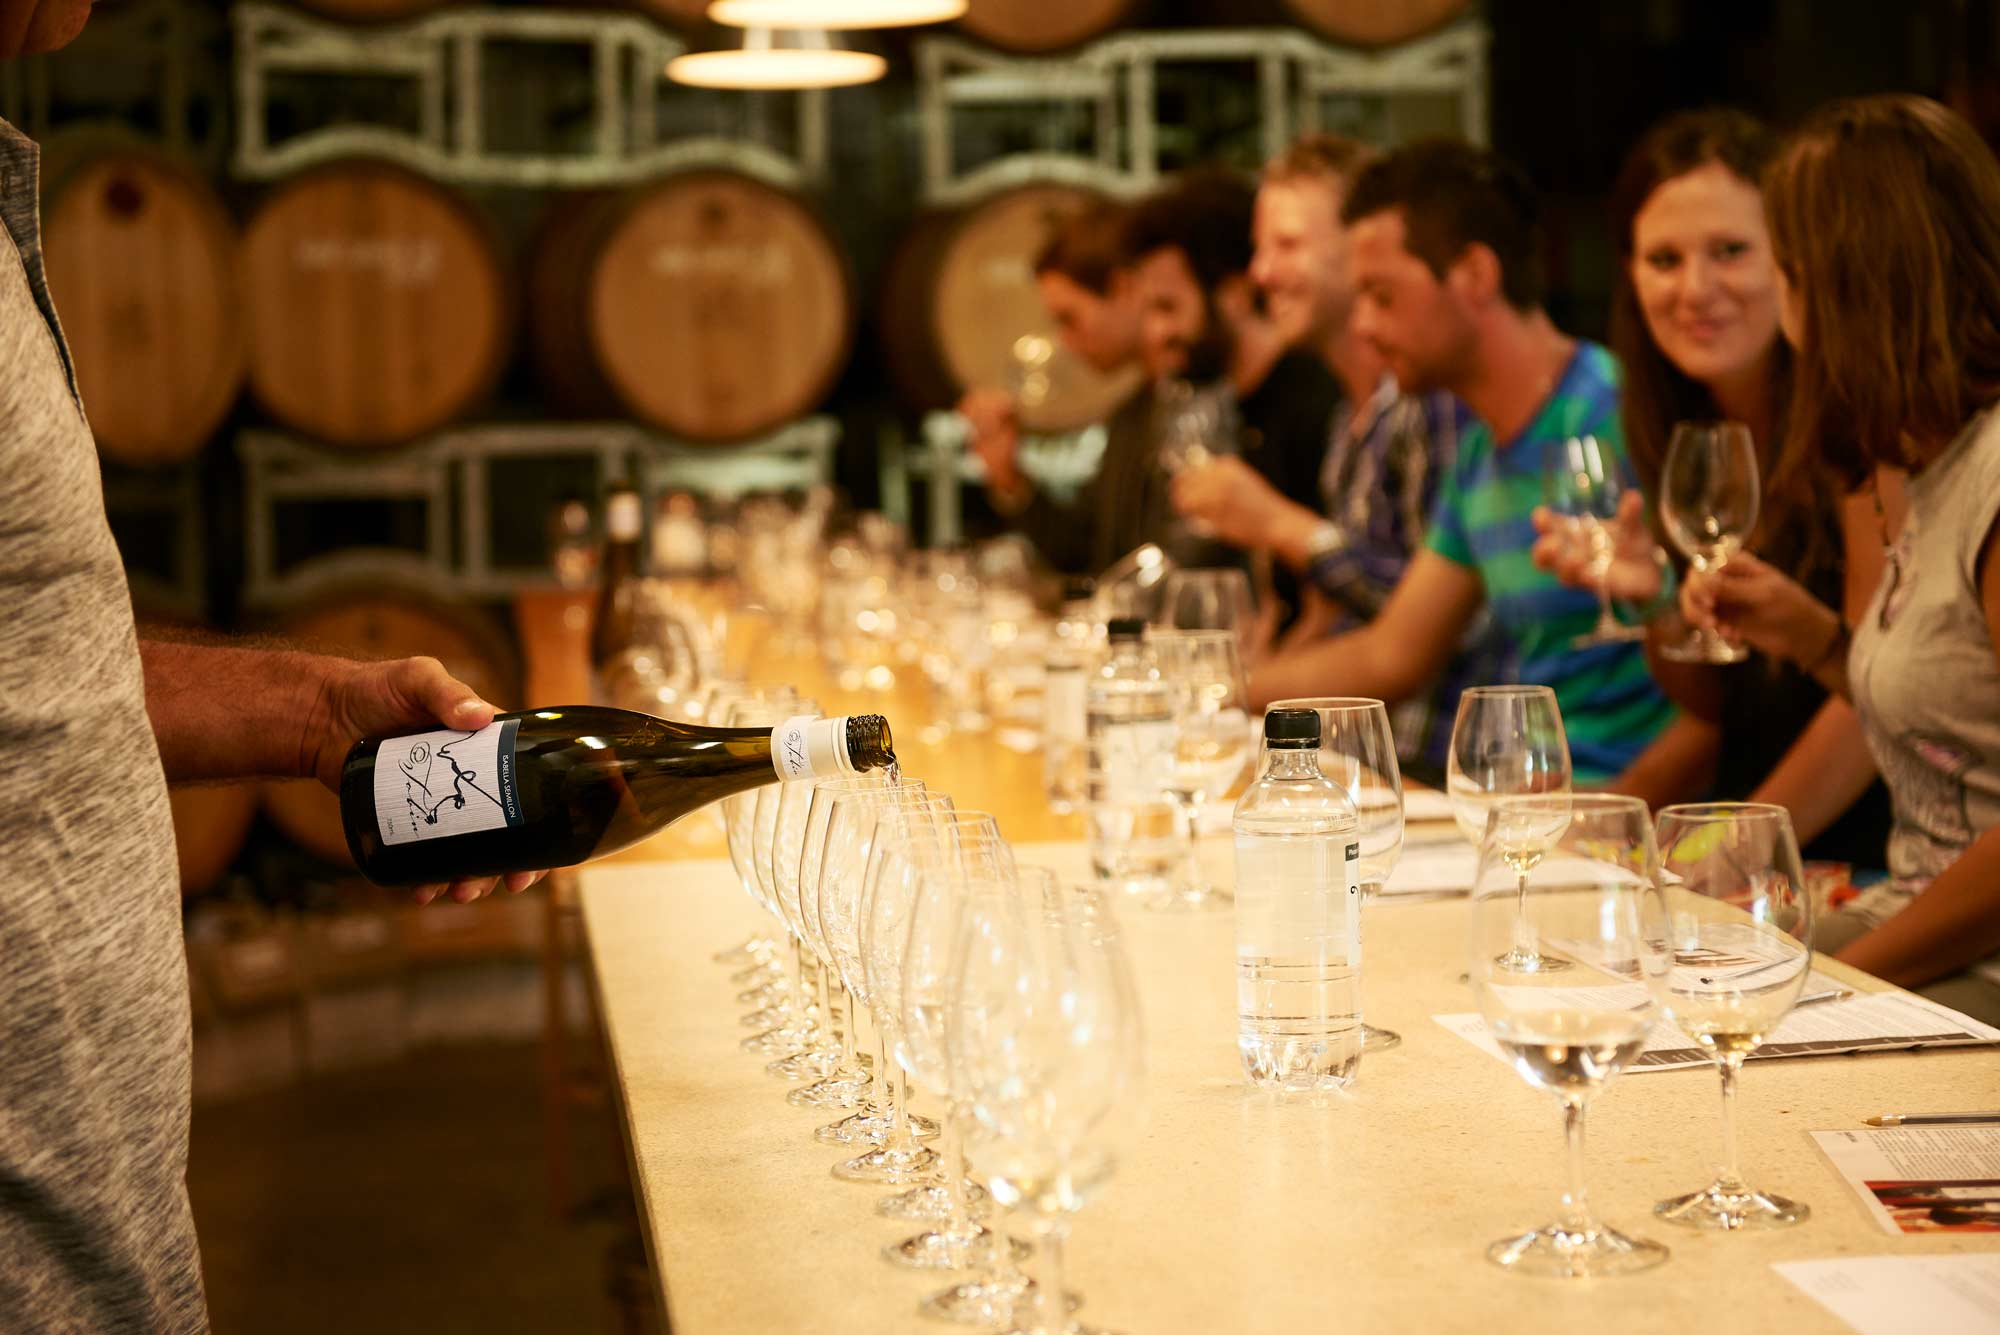 Tobin-Wines-Wine-Tasting.jpg